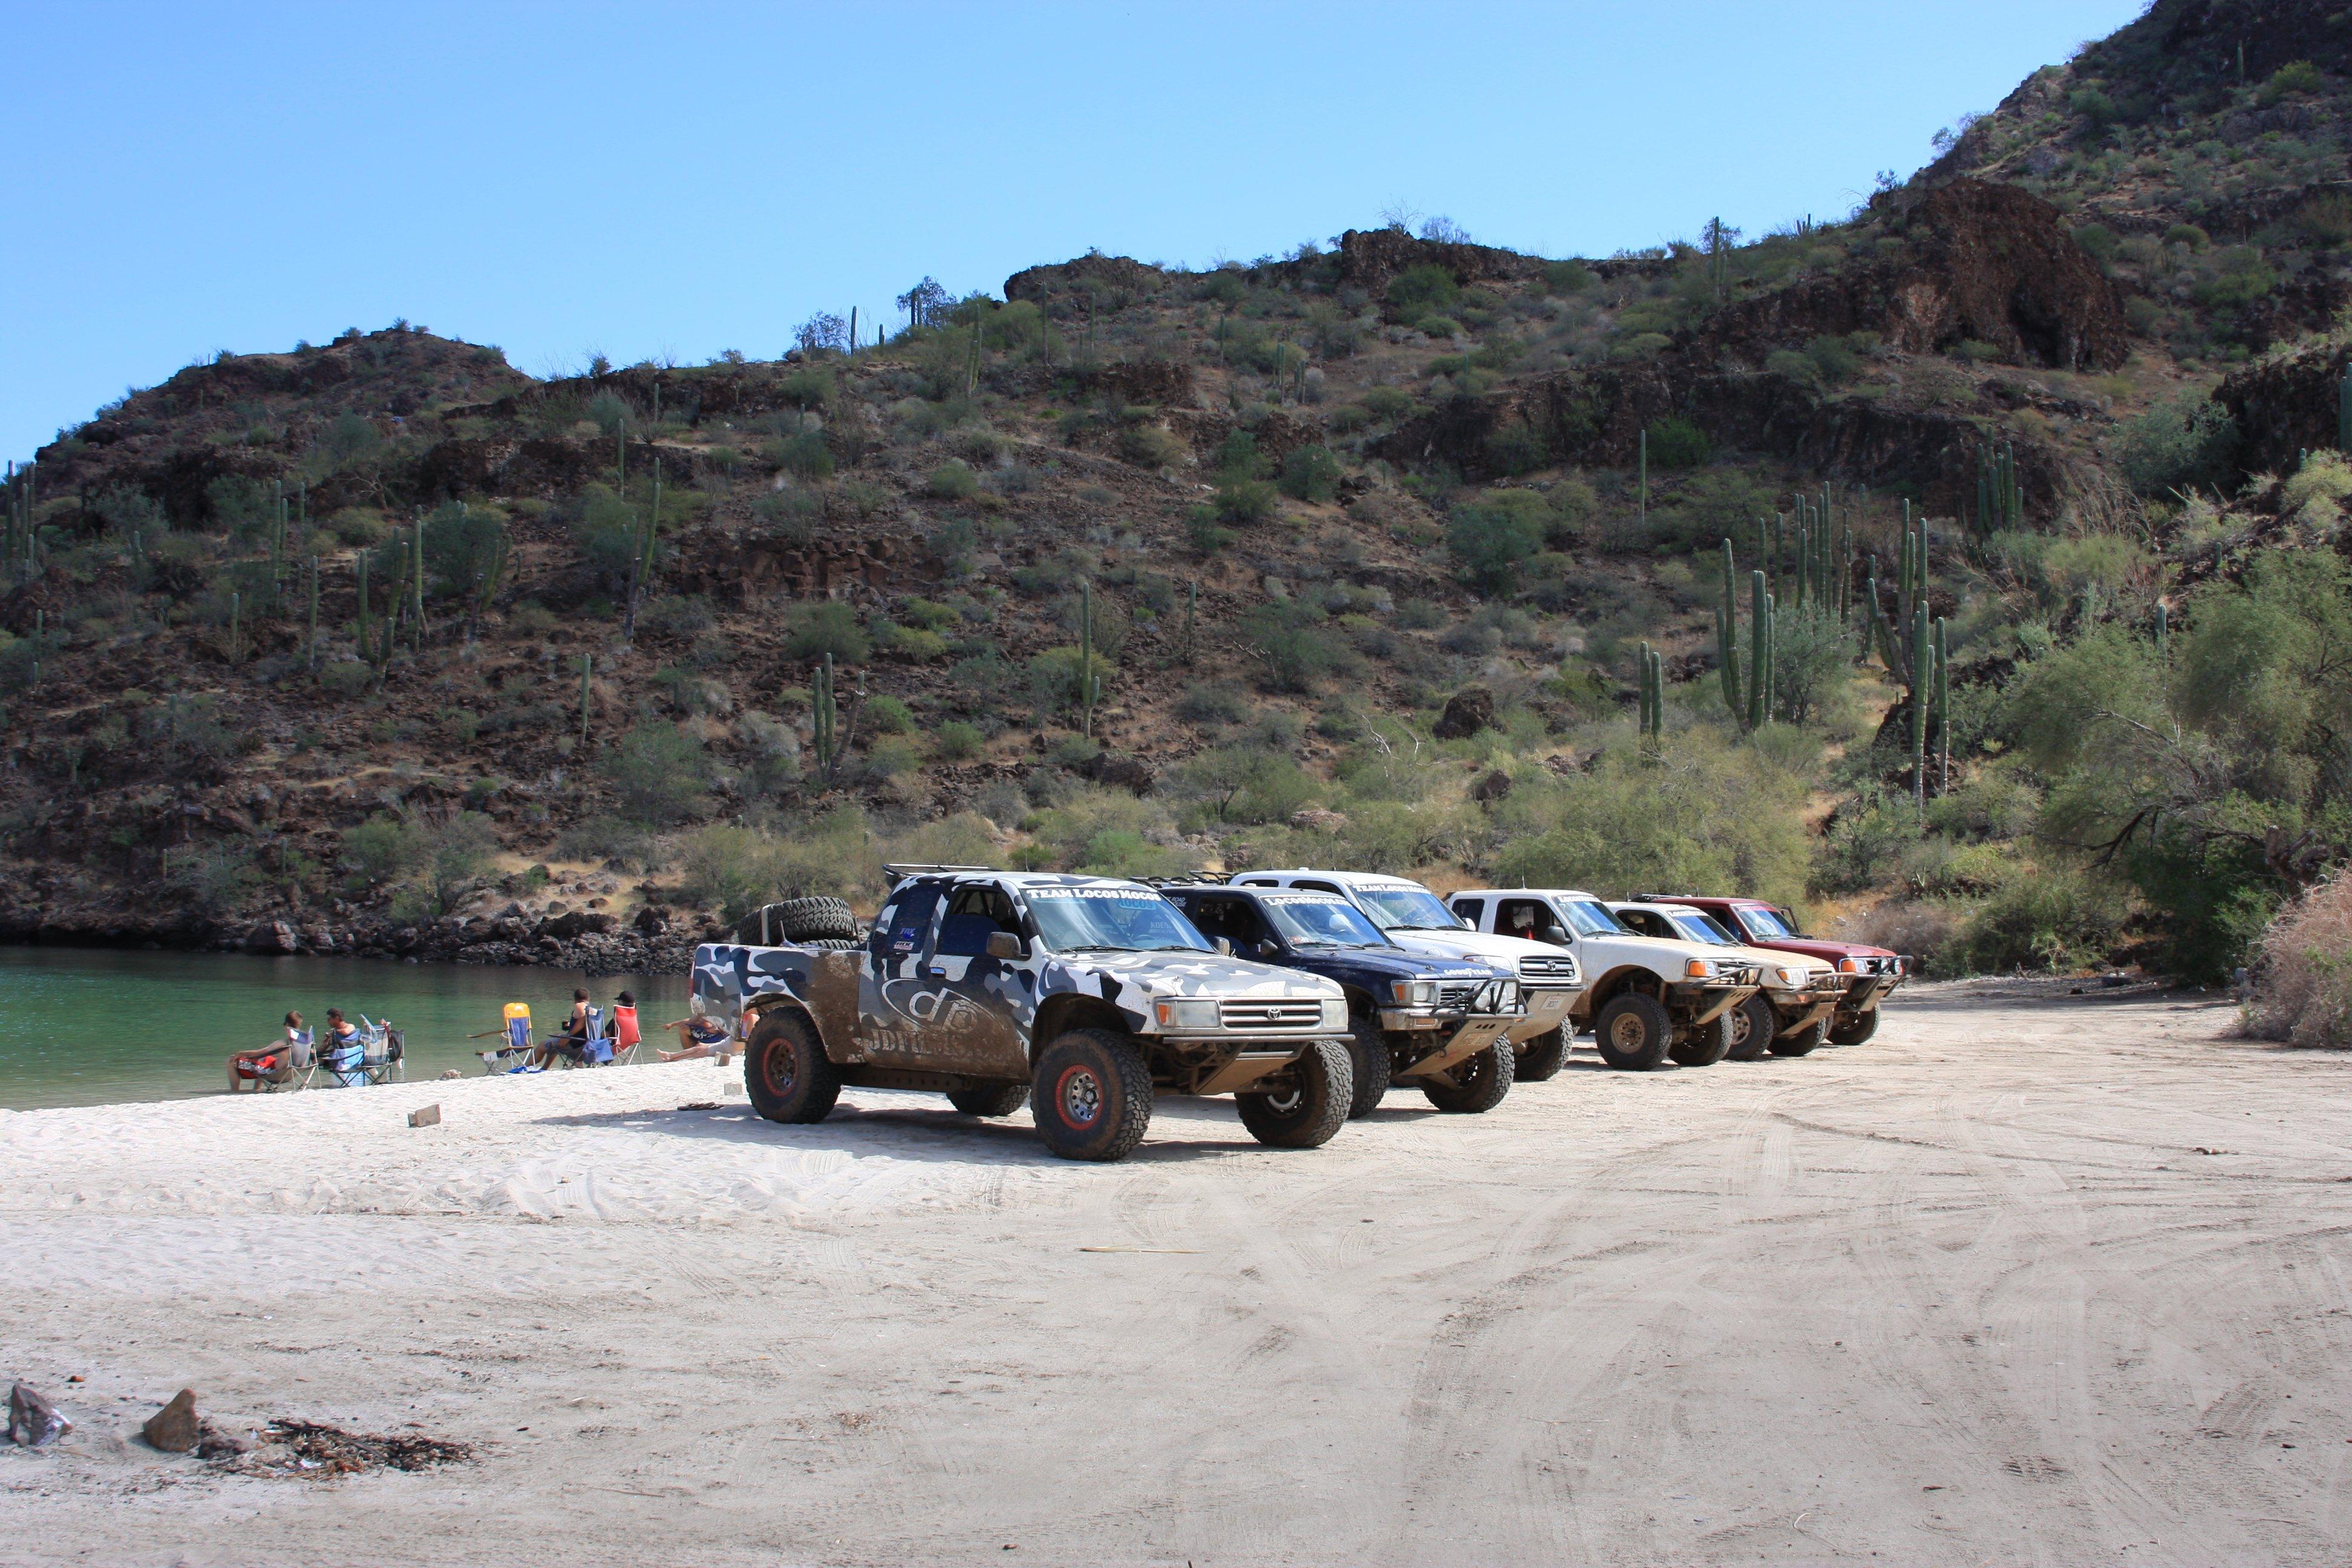 2007-Baja1000-LocosMocos-2.JPG